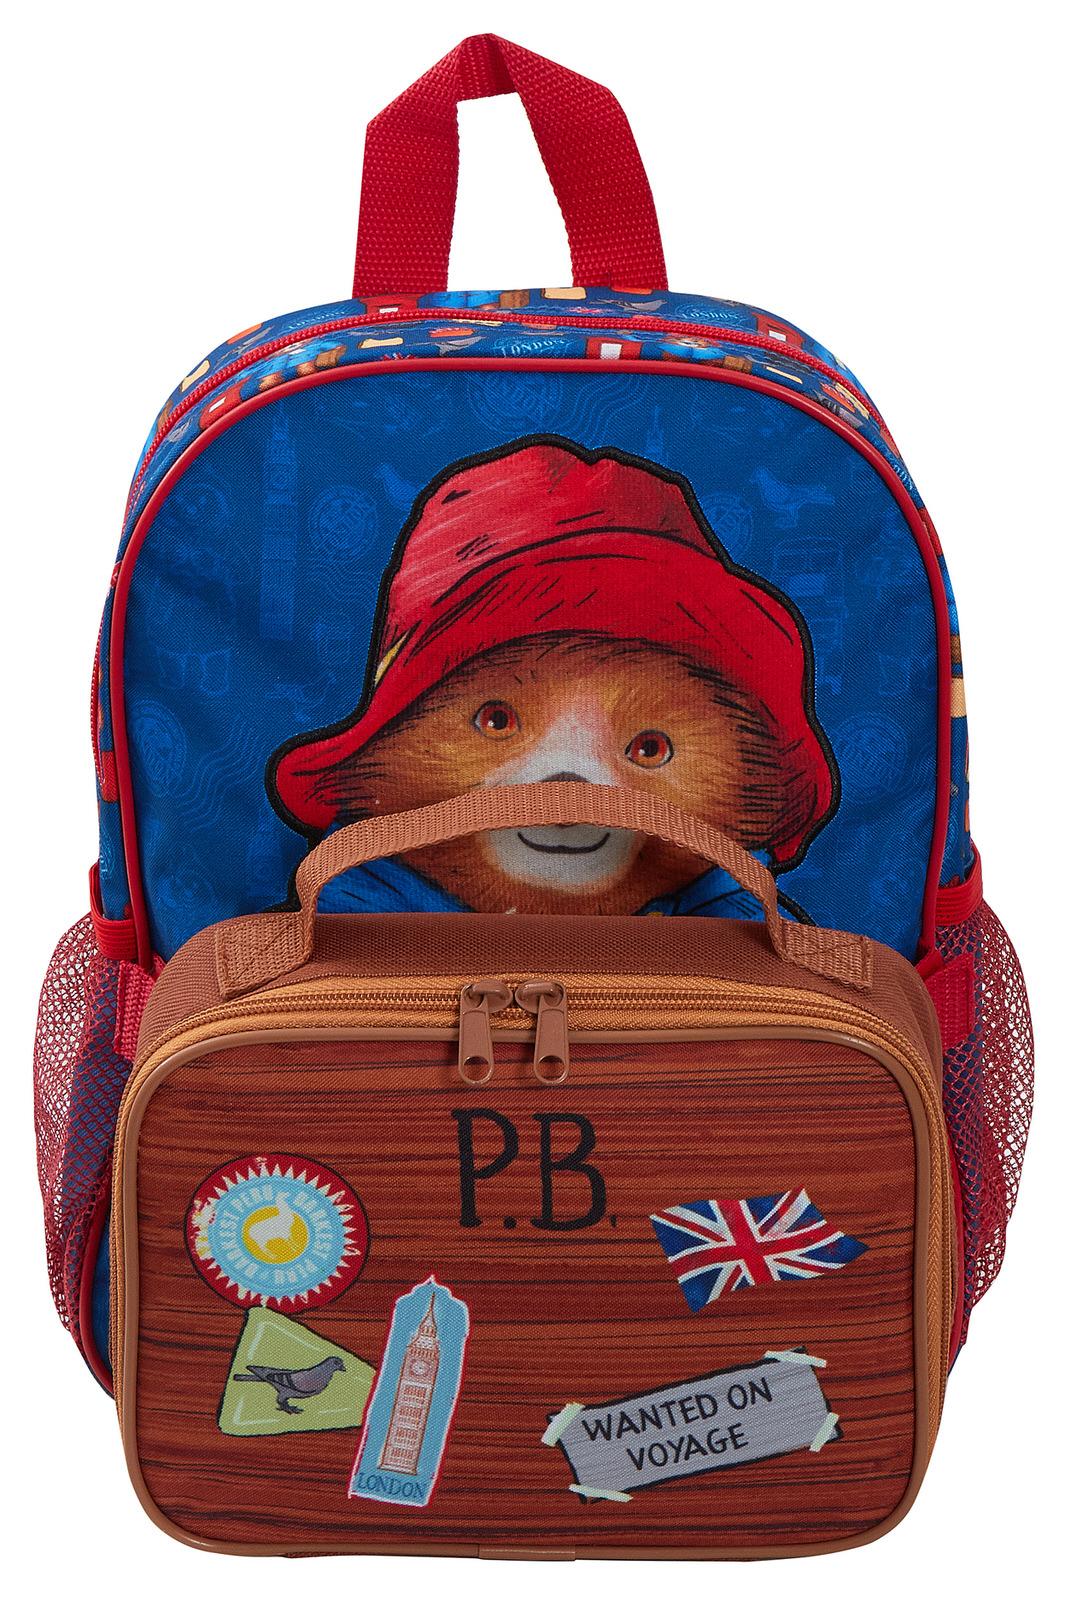 miniatuur 13 - Paddington Bear Kids Backpack + Detachable Lunch Bag/Pencil Case Nursery School